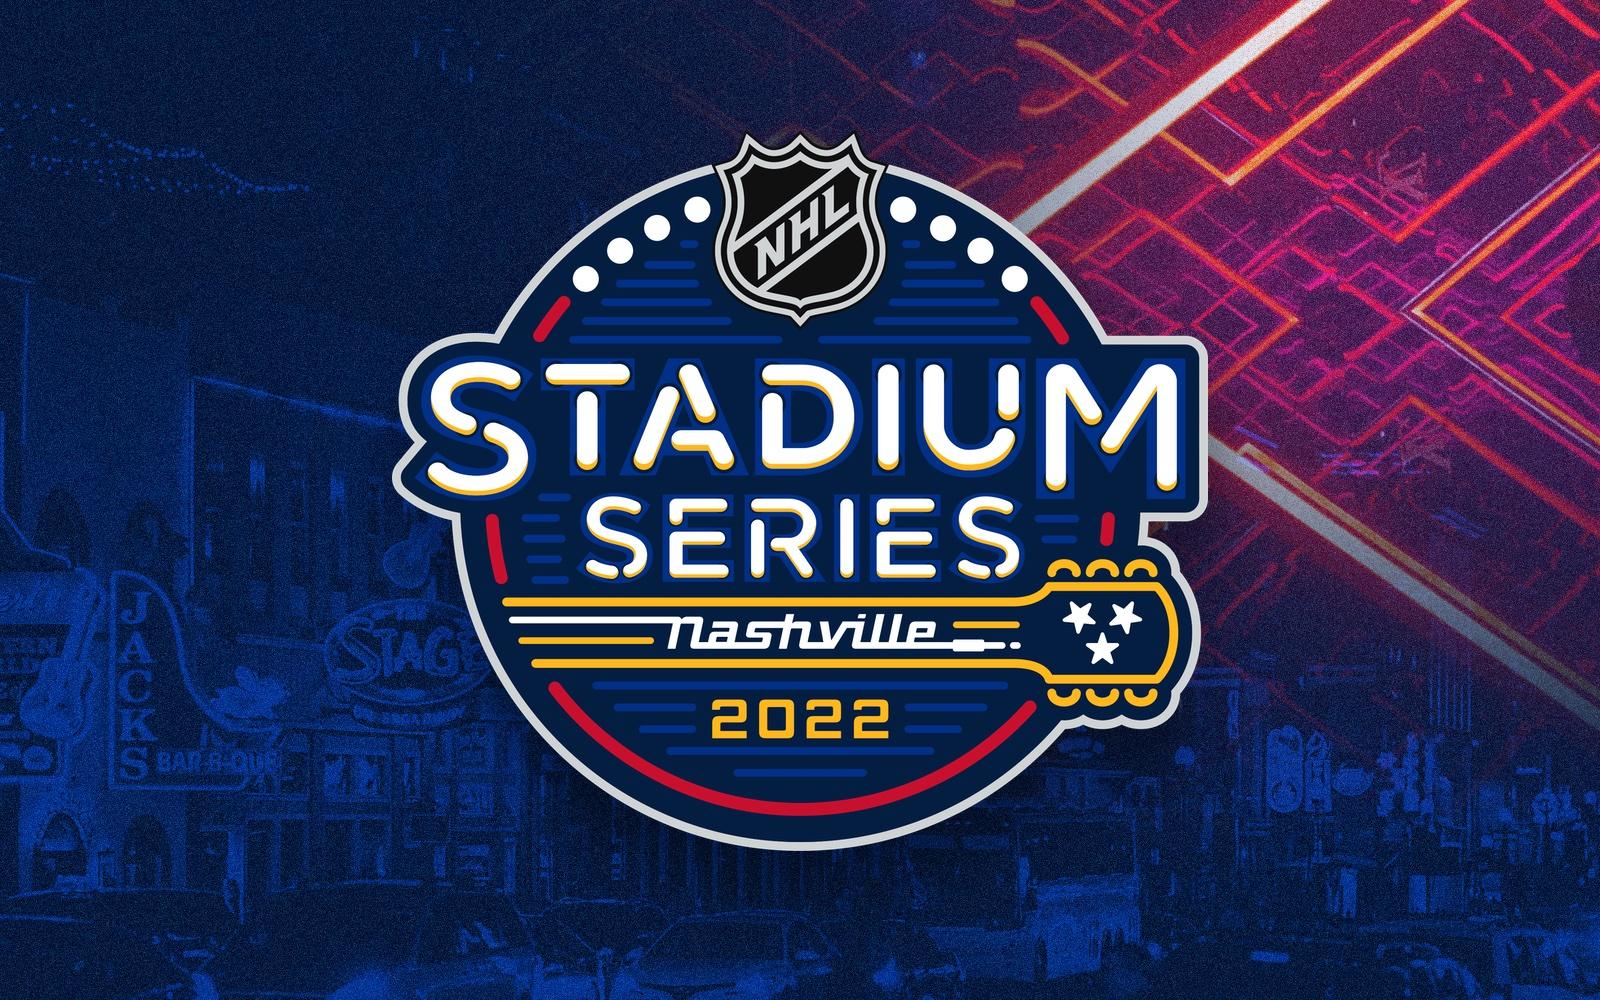 NHL releases 2022 Stadium Series logo